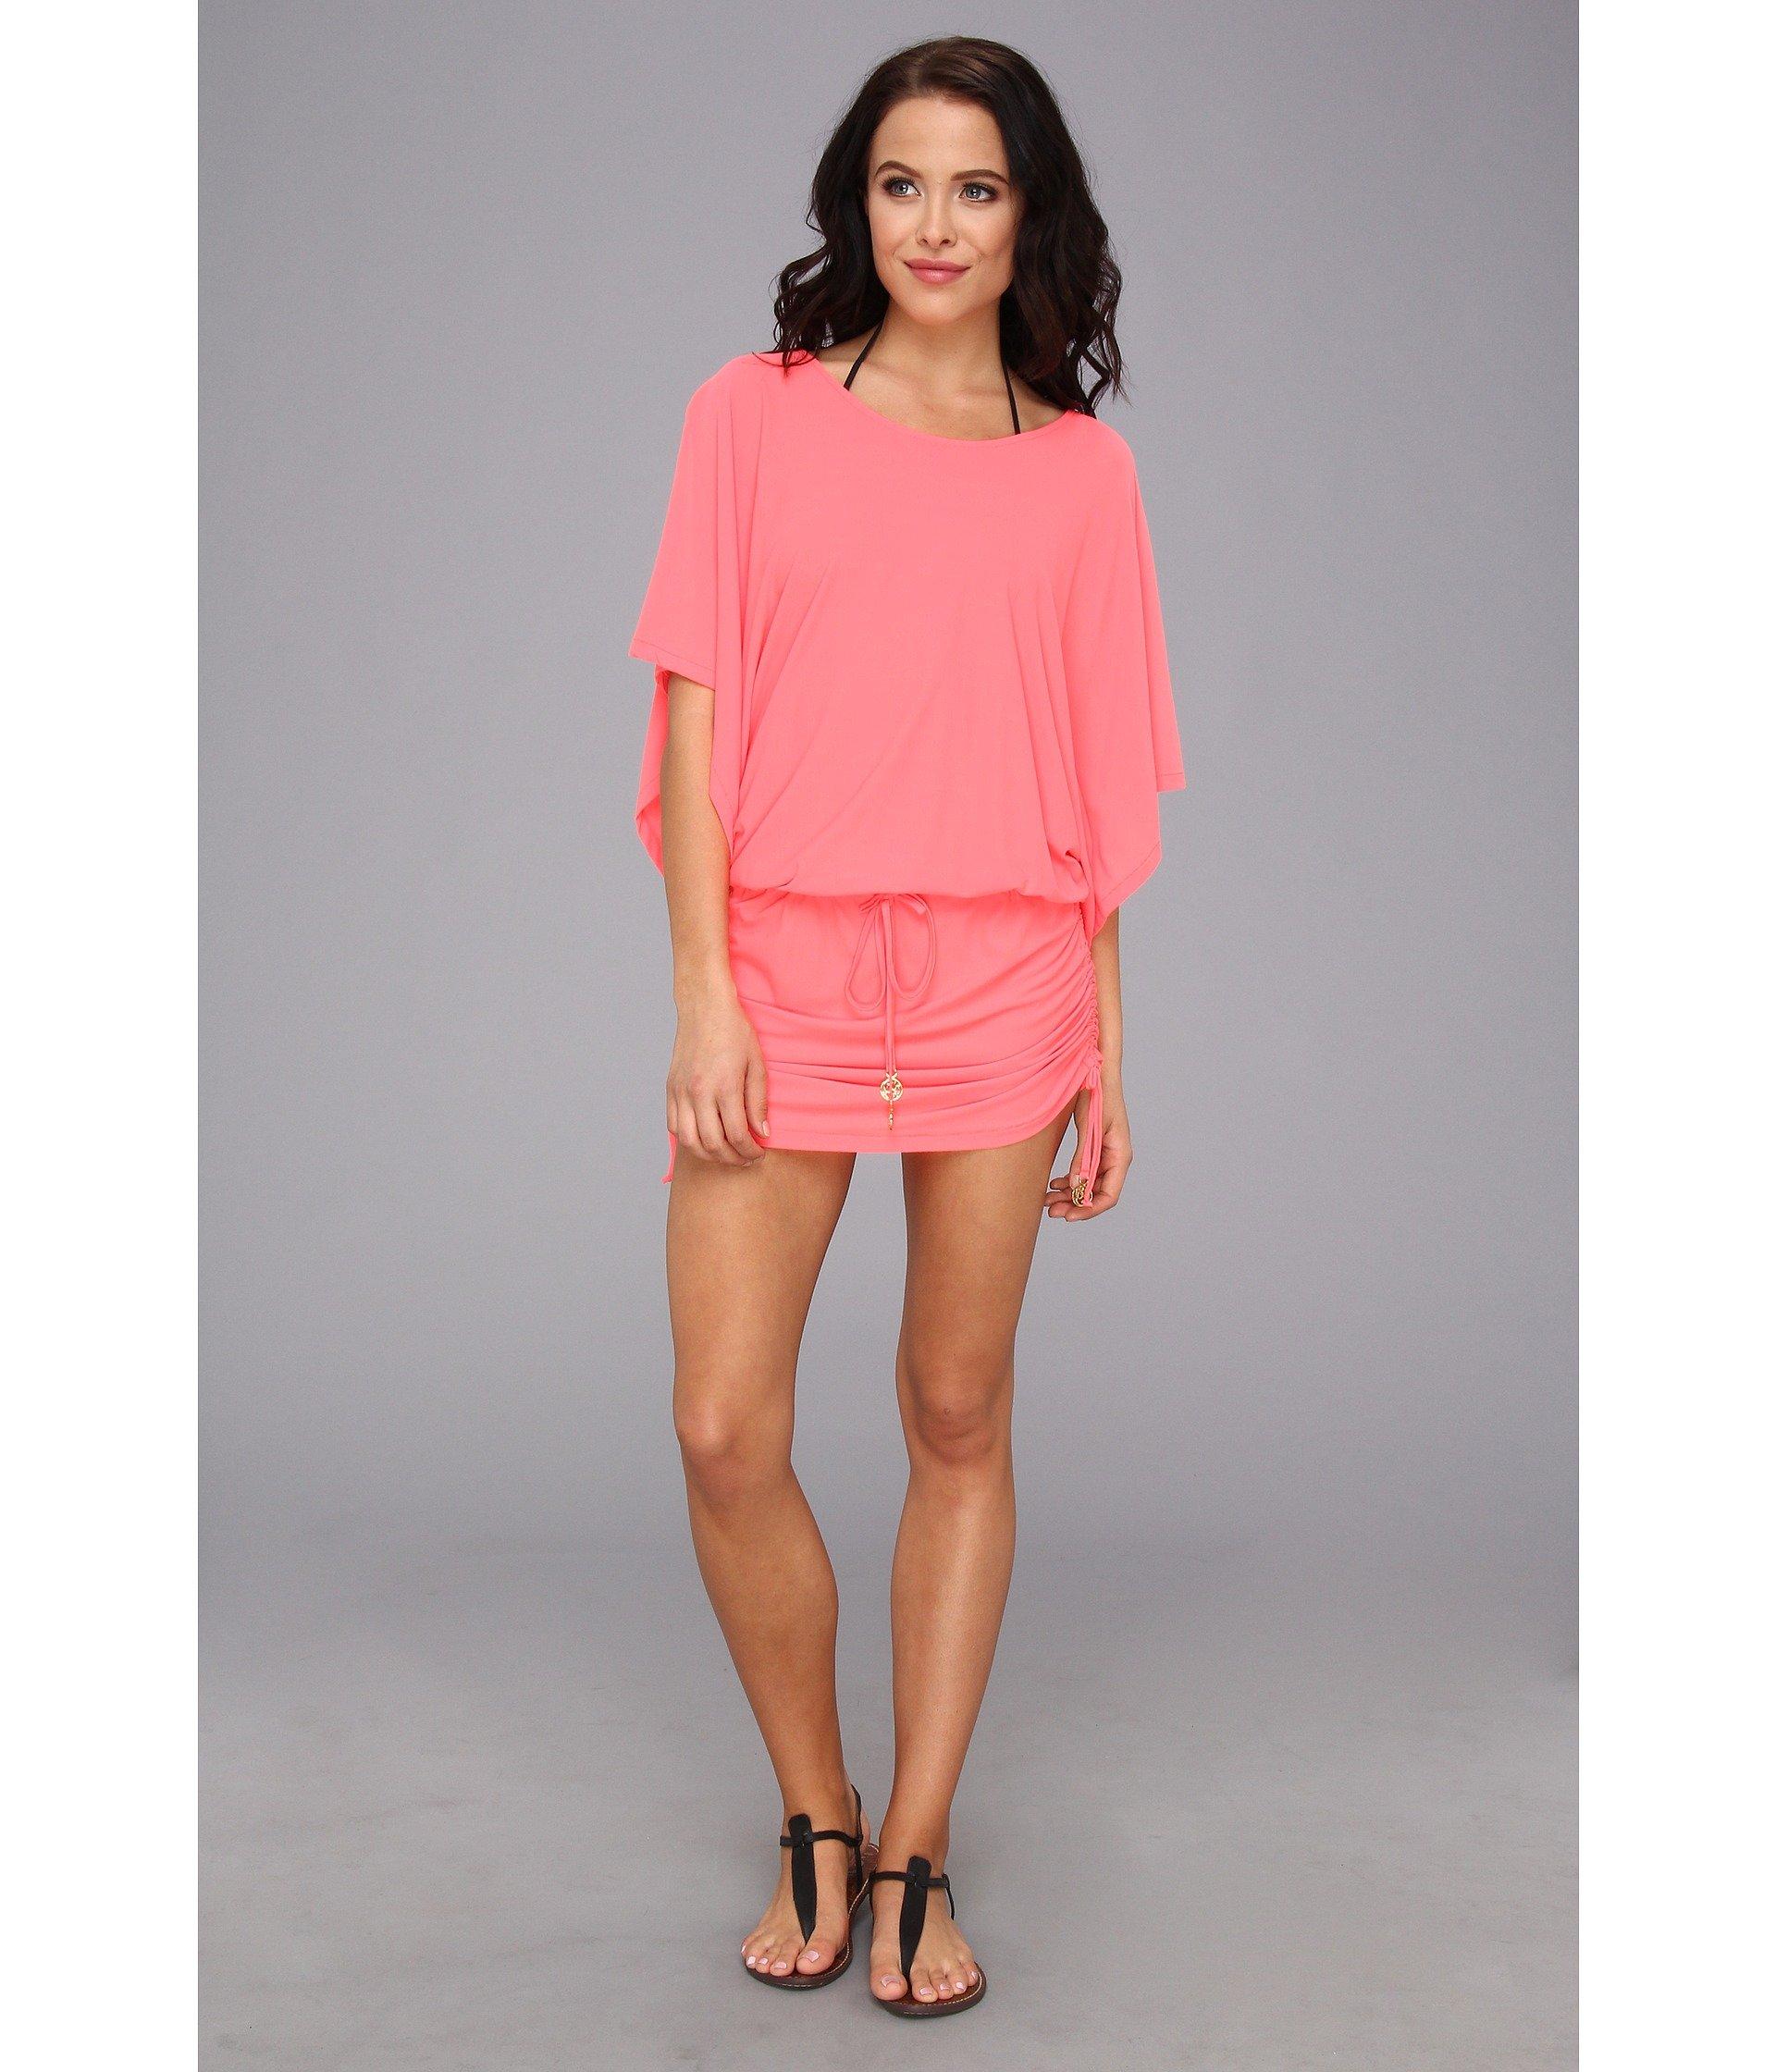 Luli Fama Cosita Buena South Beach Dress Cover-Up